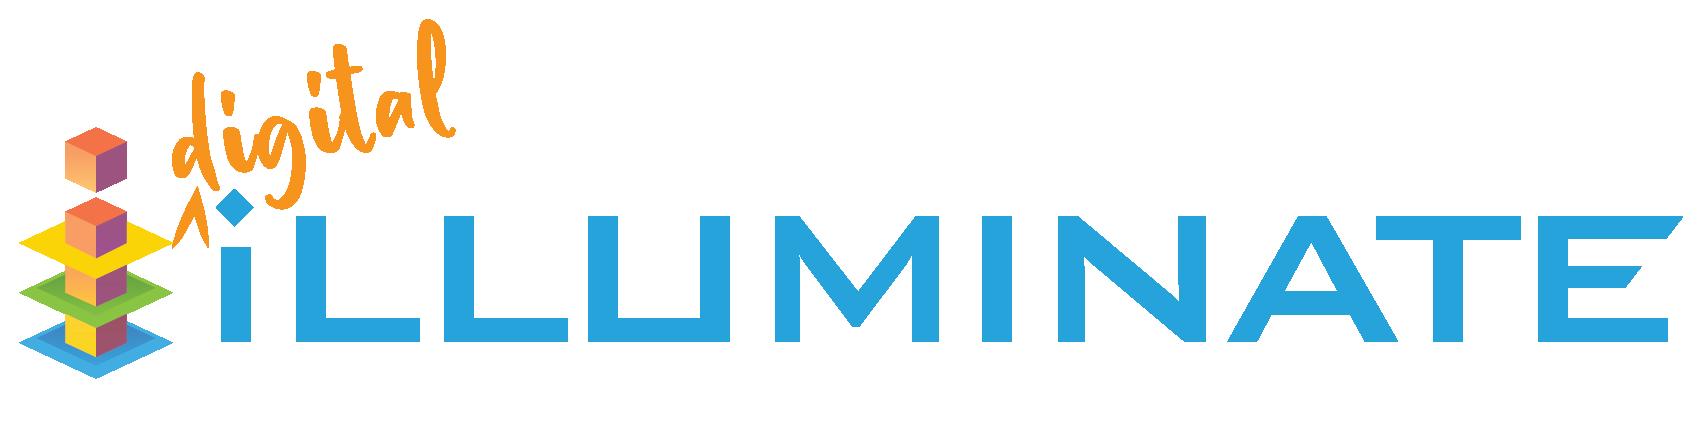 digital_illuminate-01